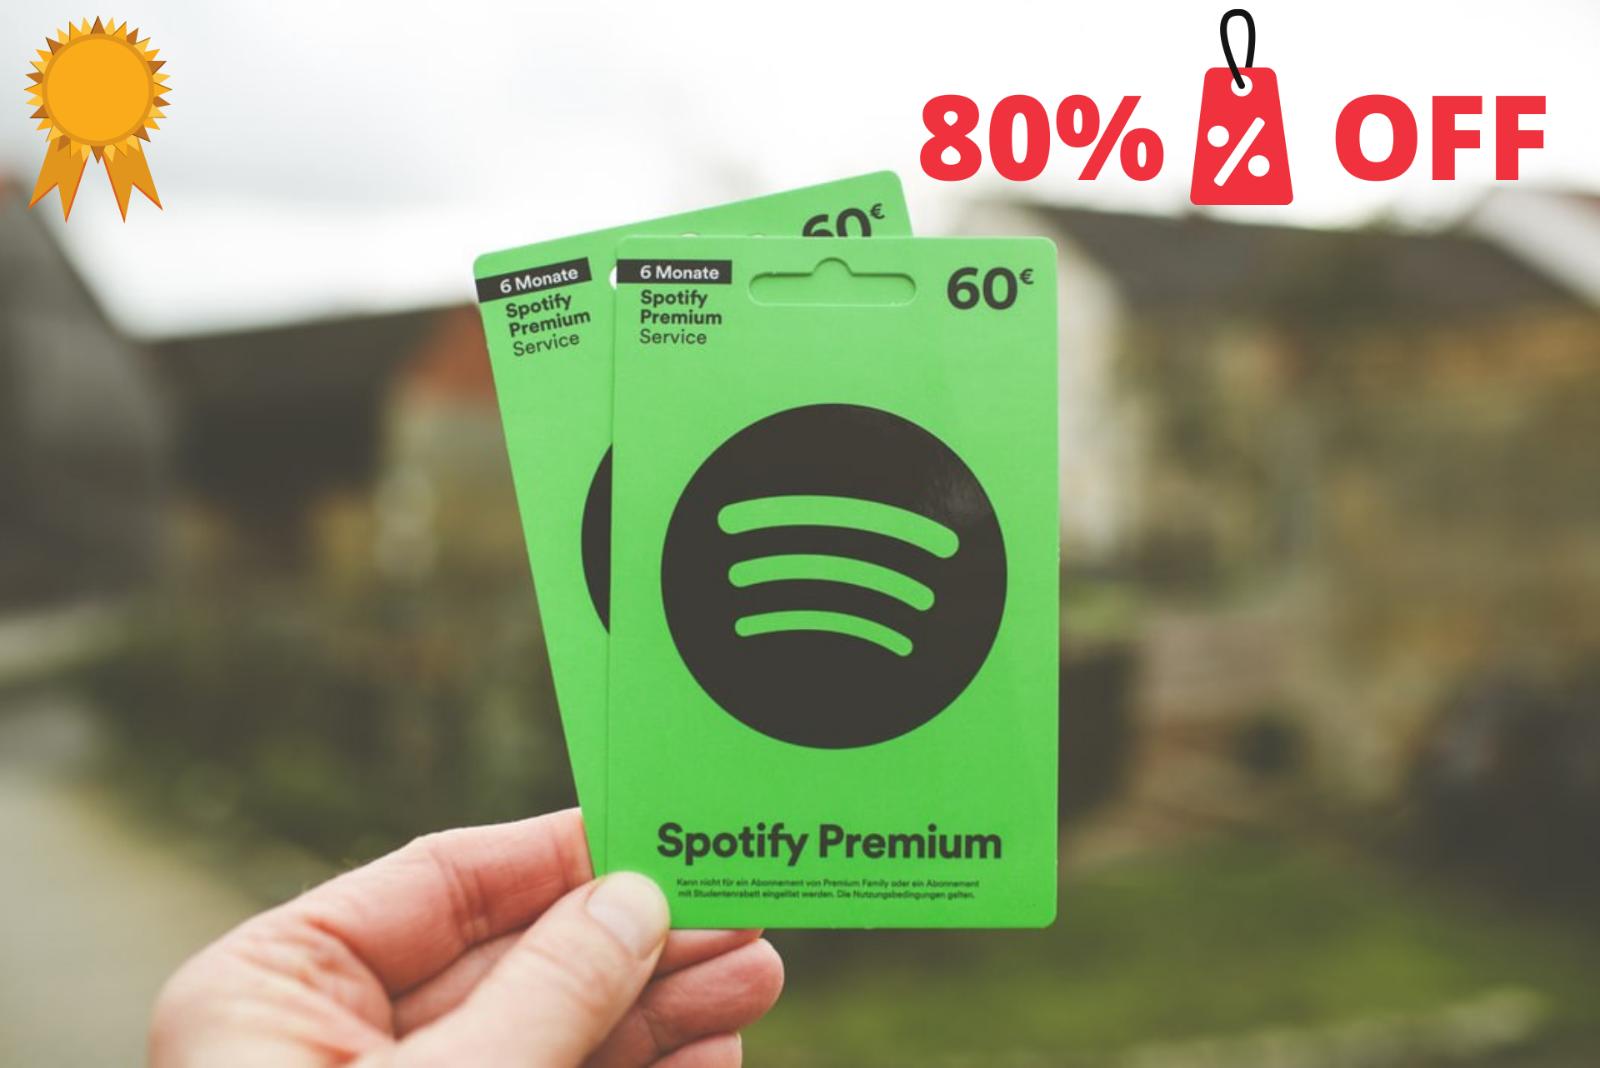 Spotify Premium Lifetime | 1 Year Warranty | Personal | Legal Account Worldwide 1